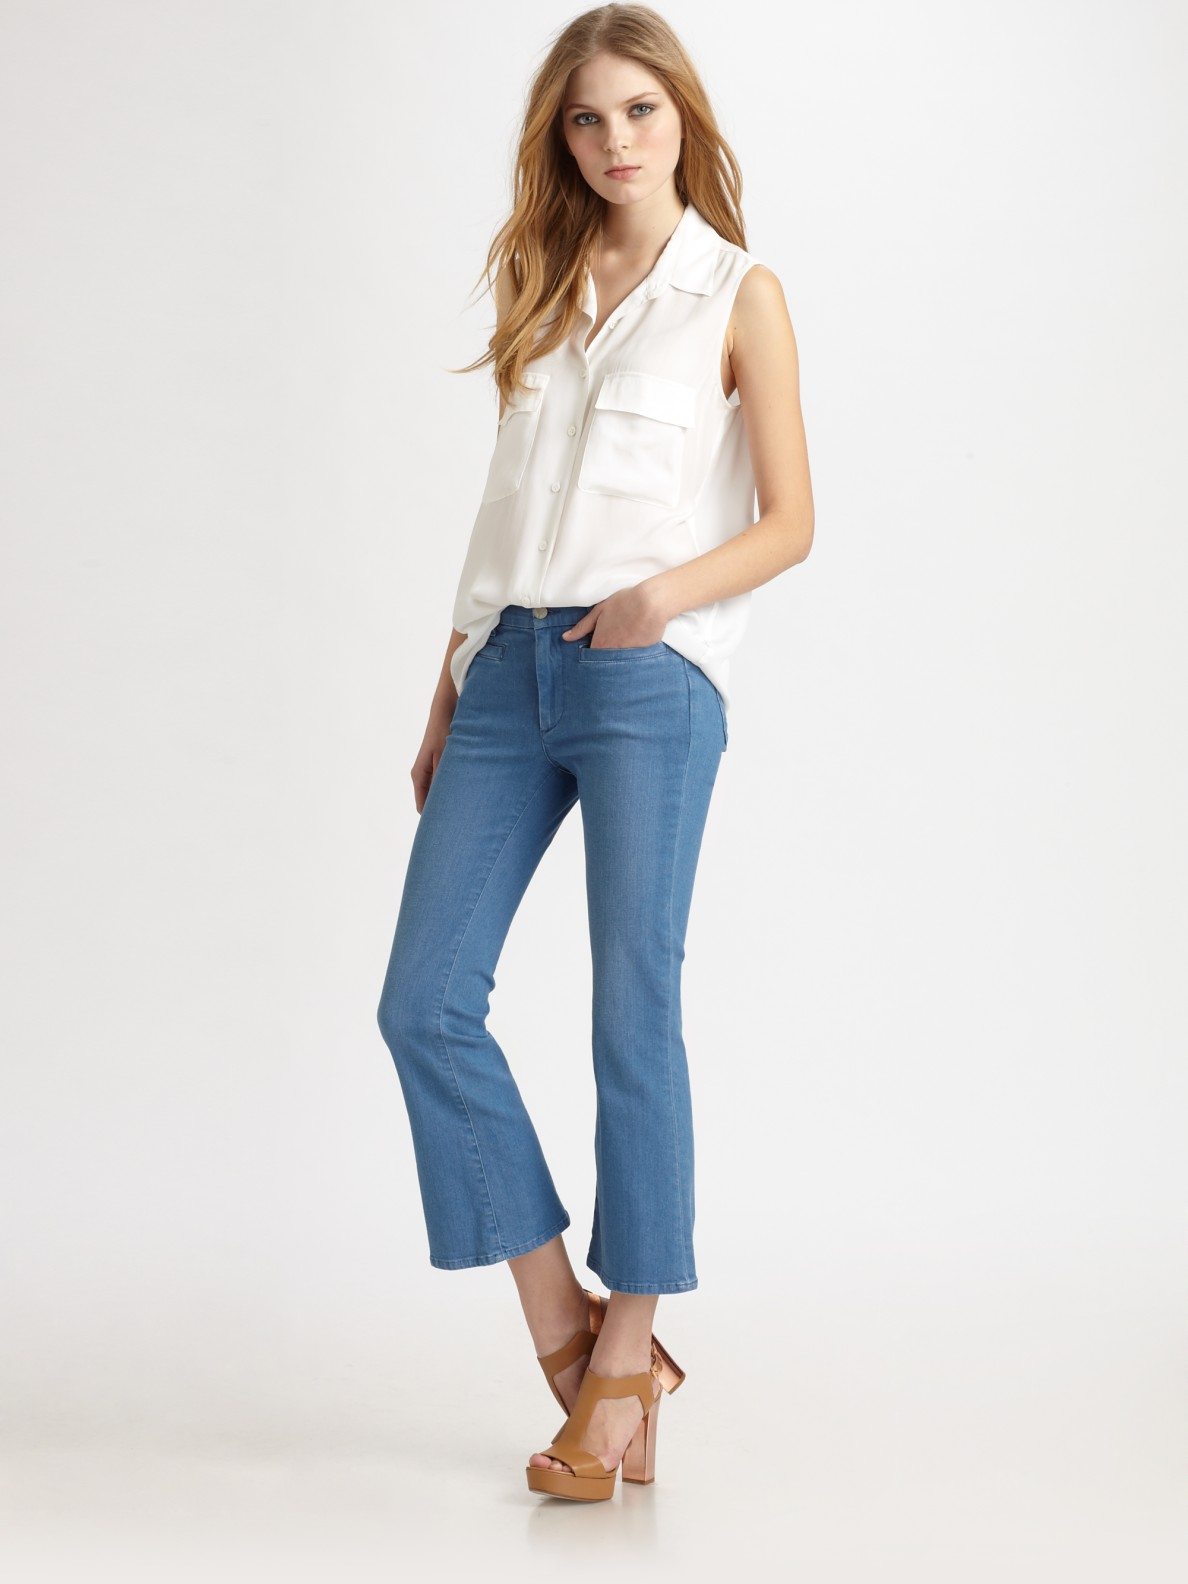 m i h jeans monaco cropped flare jeans in blue lyst. Black Bedroom Furniture Sets. Home Design Ideas